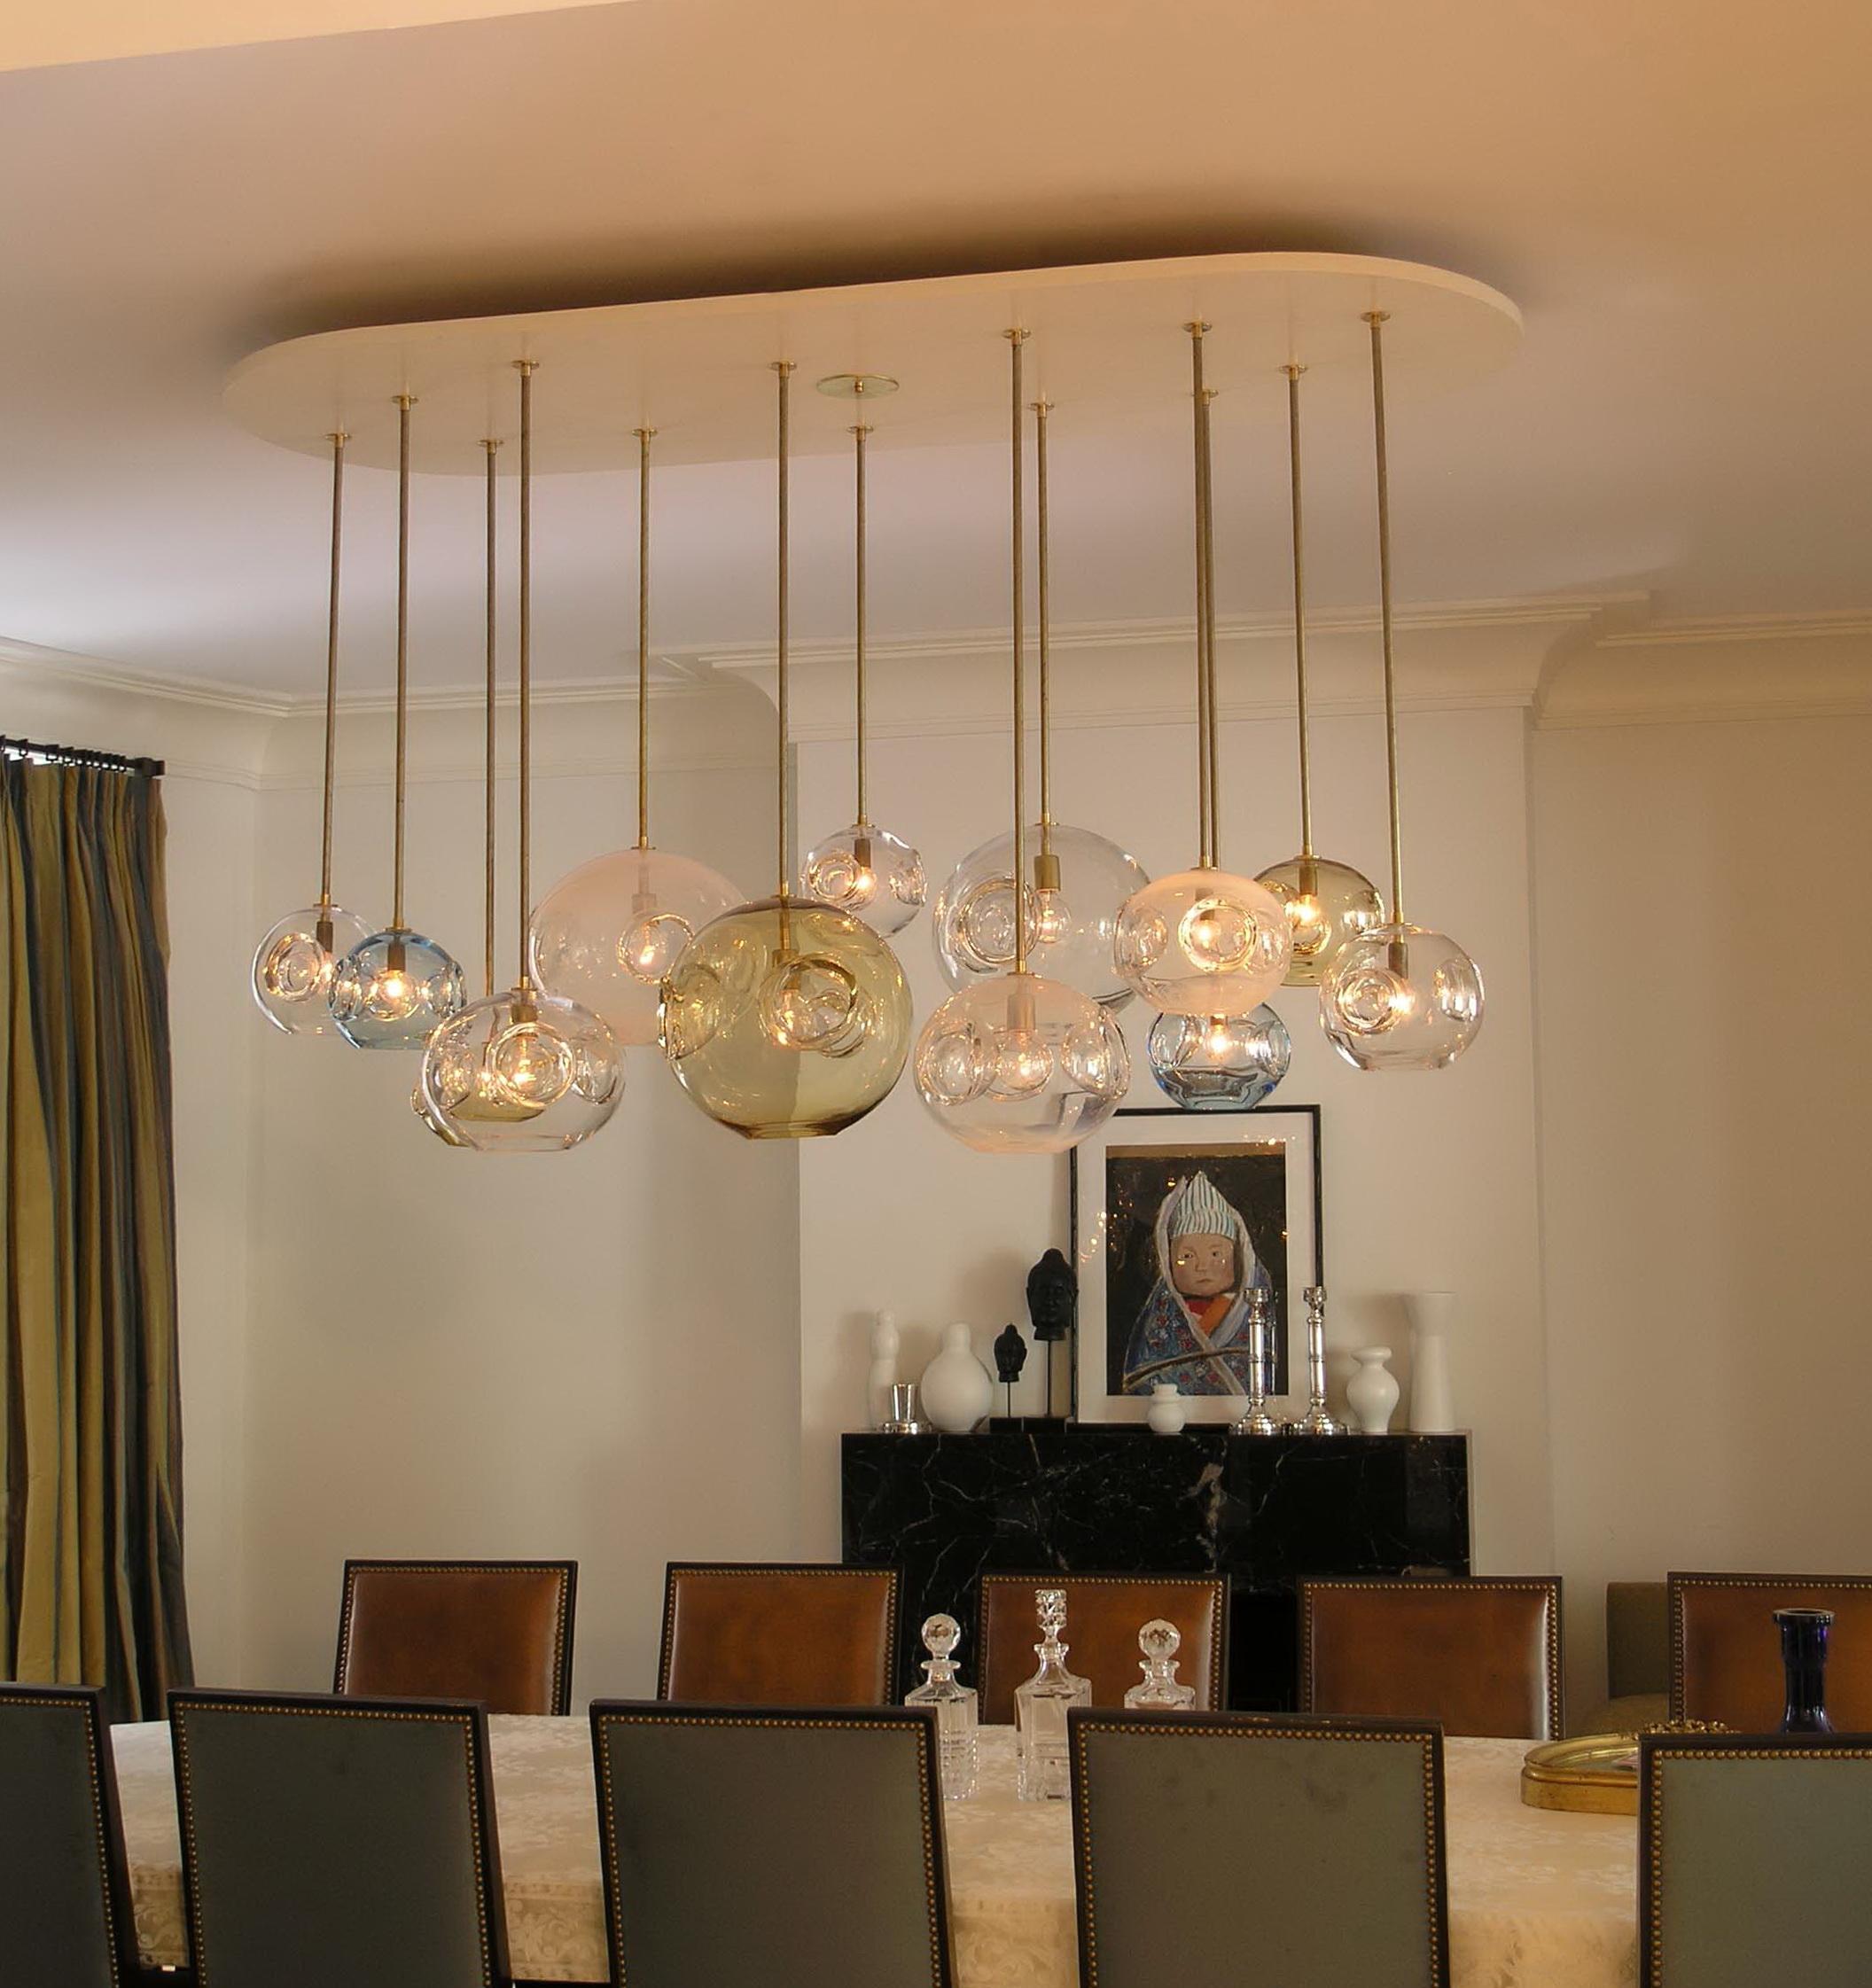 Diy chandelier ideas dining room best home design 2018 for Dining room diy ideas